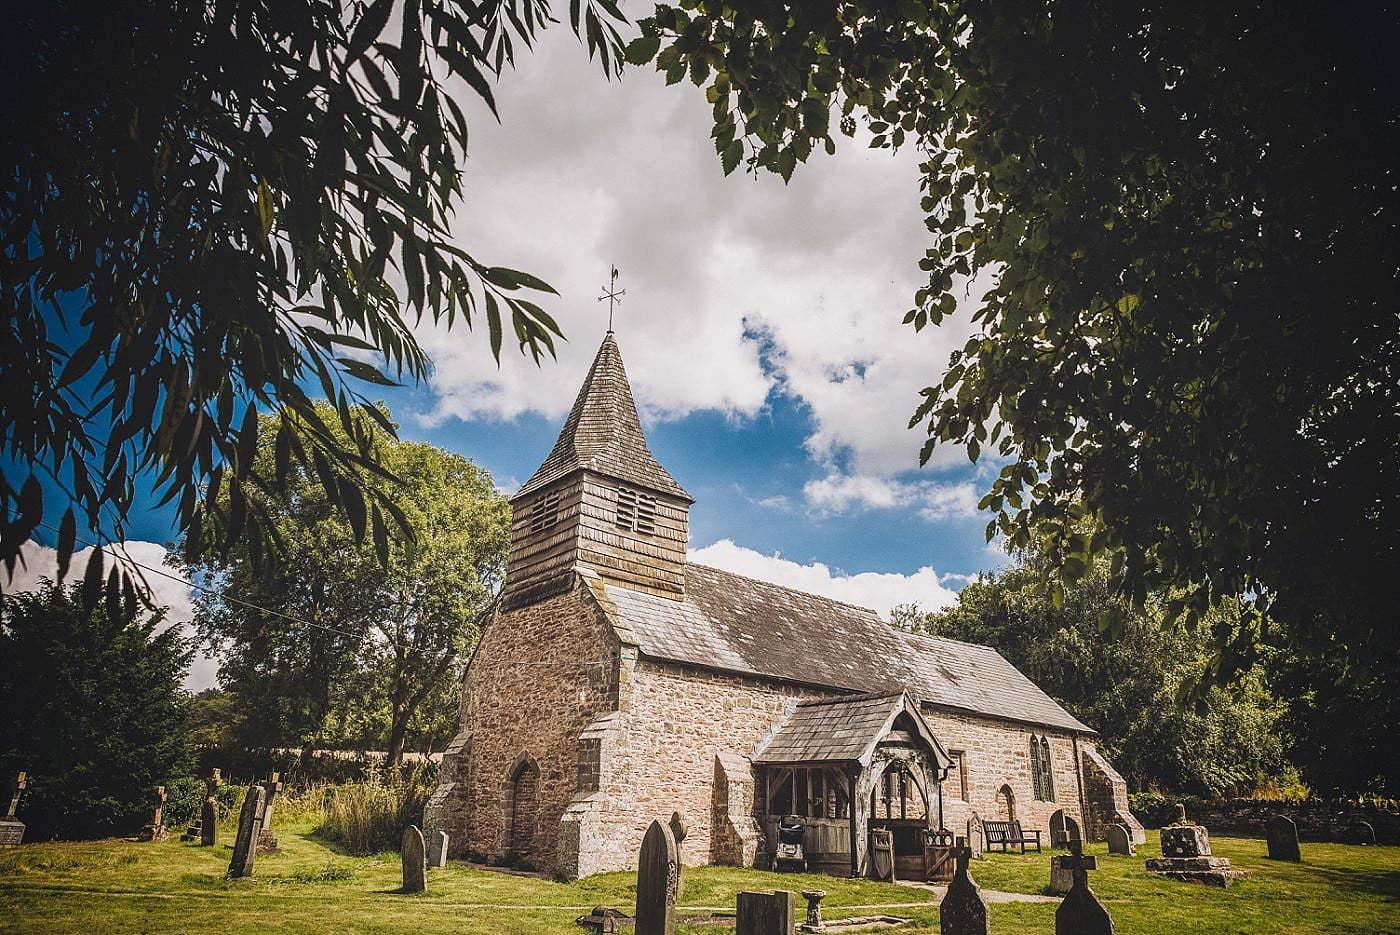 dewsall church